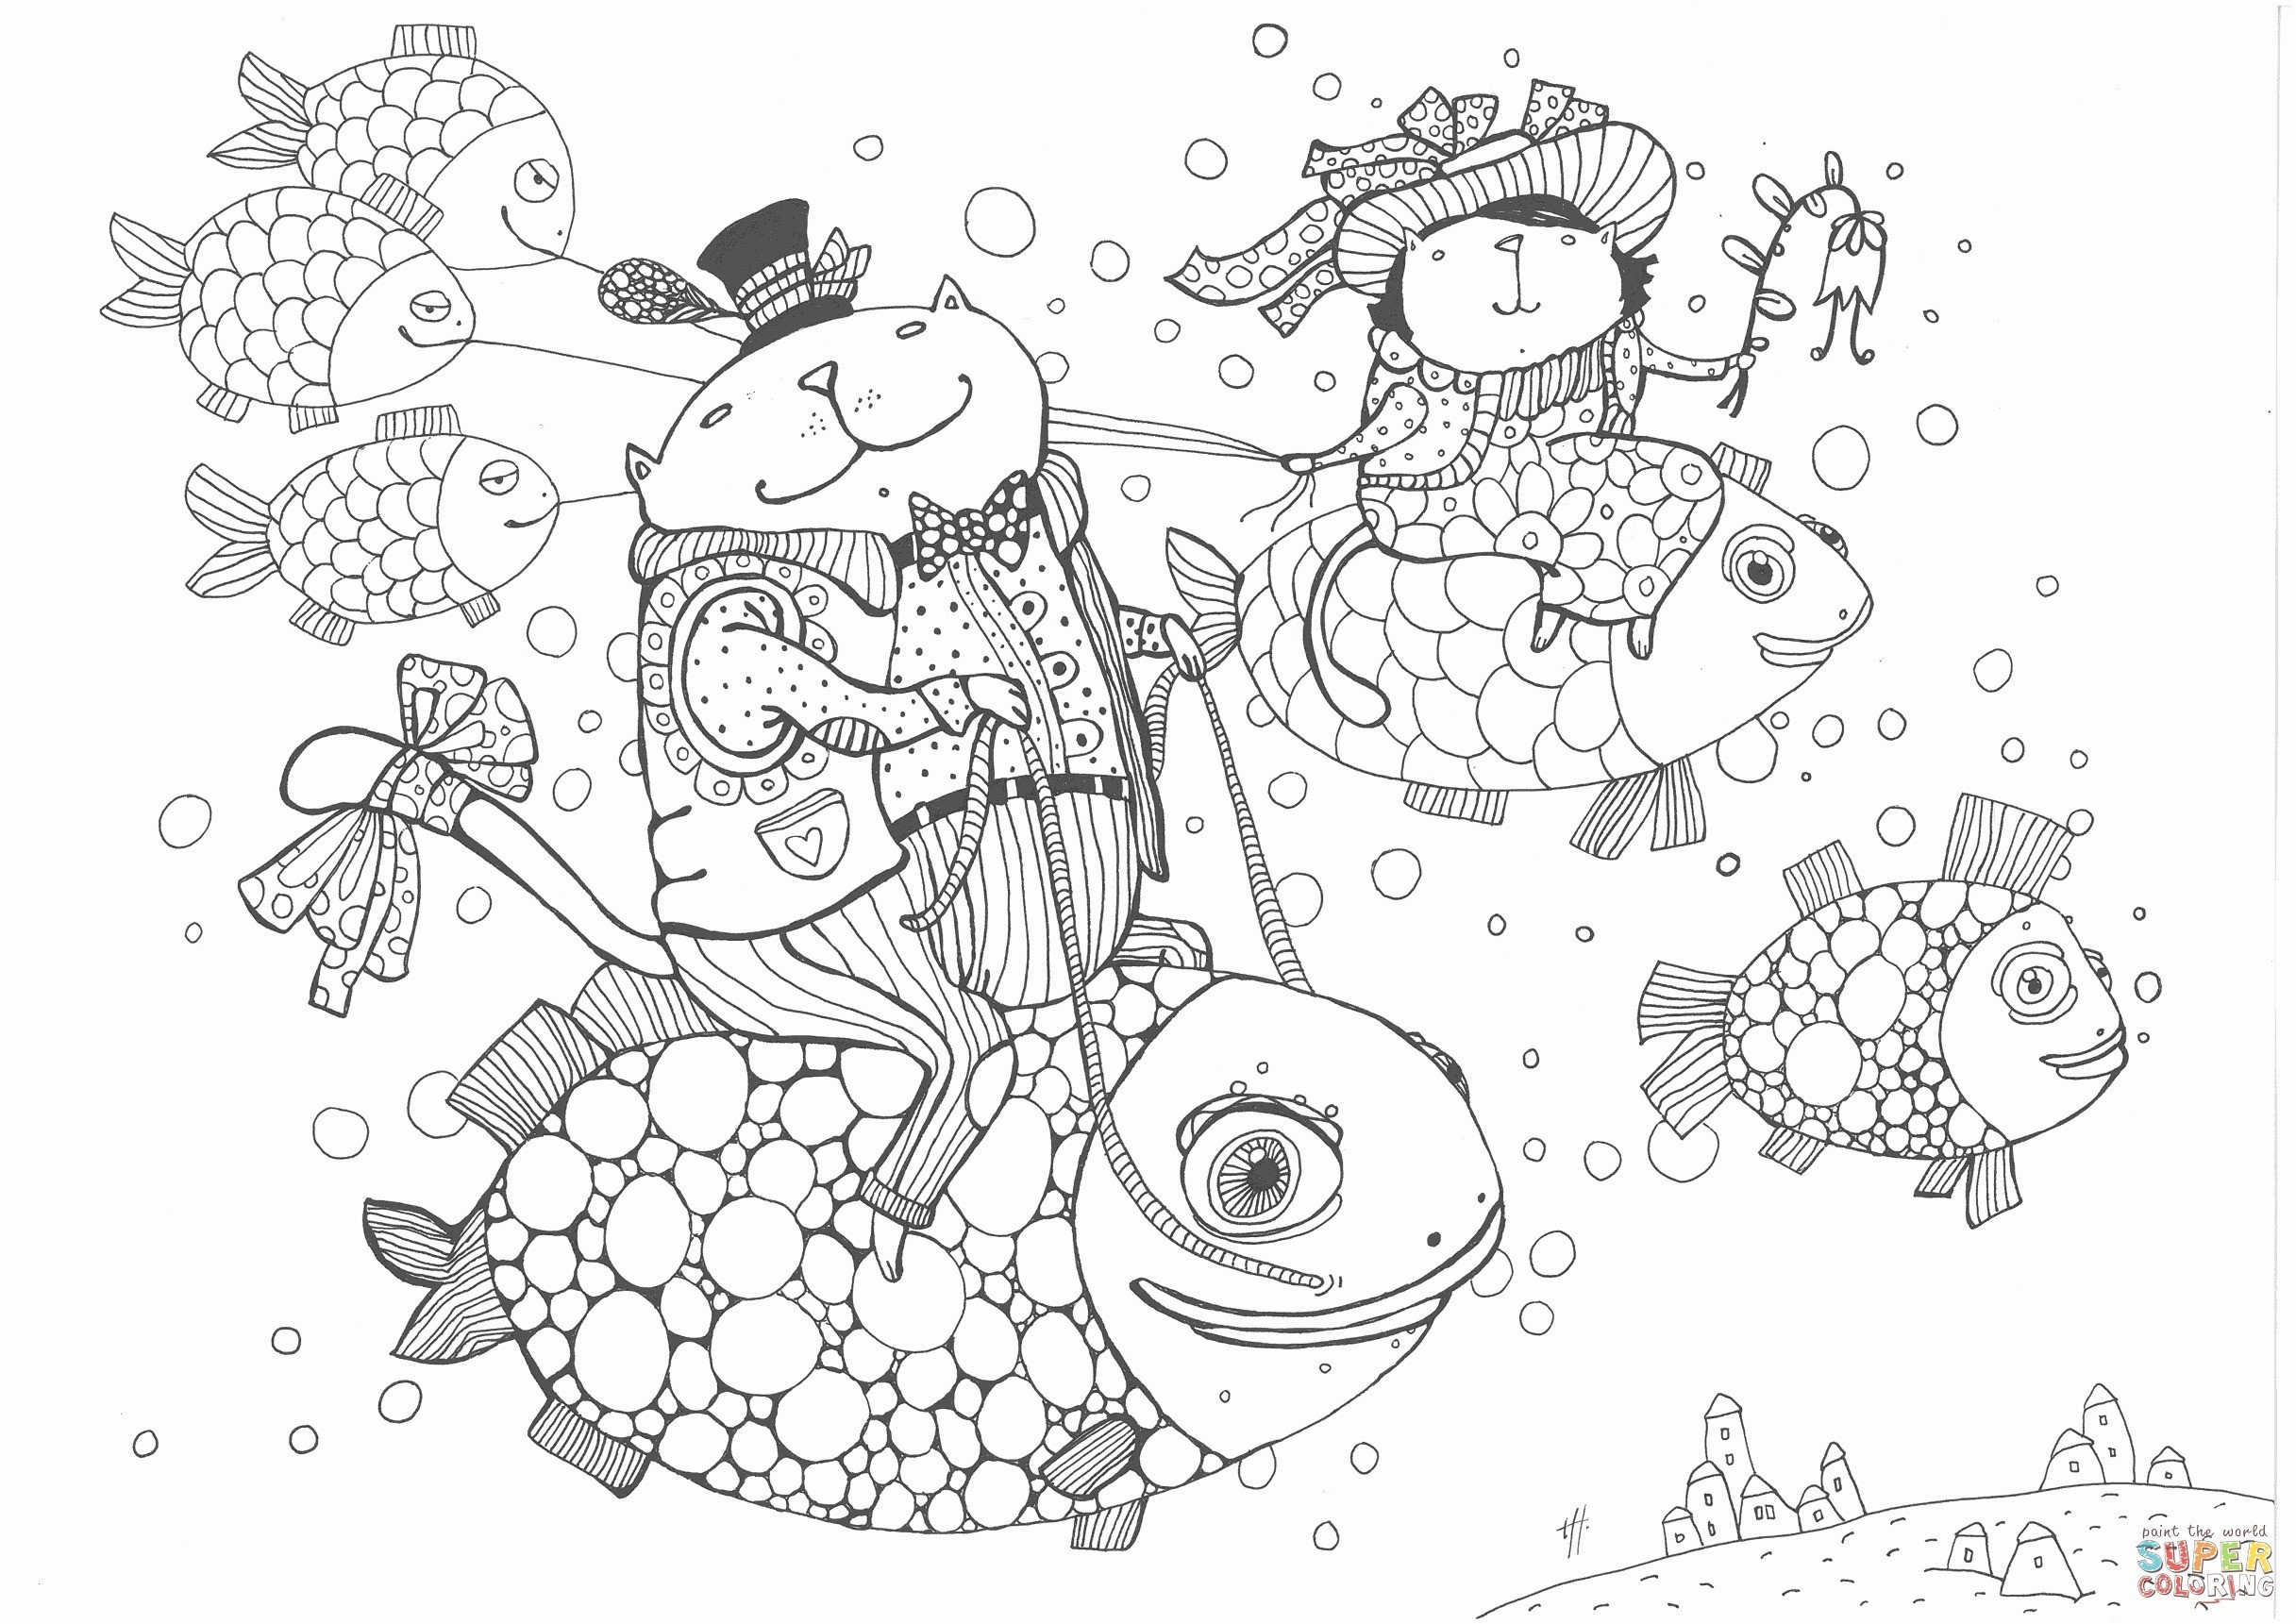 Ausmalbilder 101 Dalmatiner Einzigartig Beautiful Dory Nemo Coloring Pages – Nocn Stock